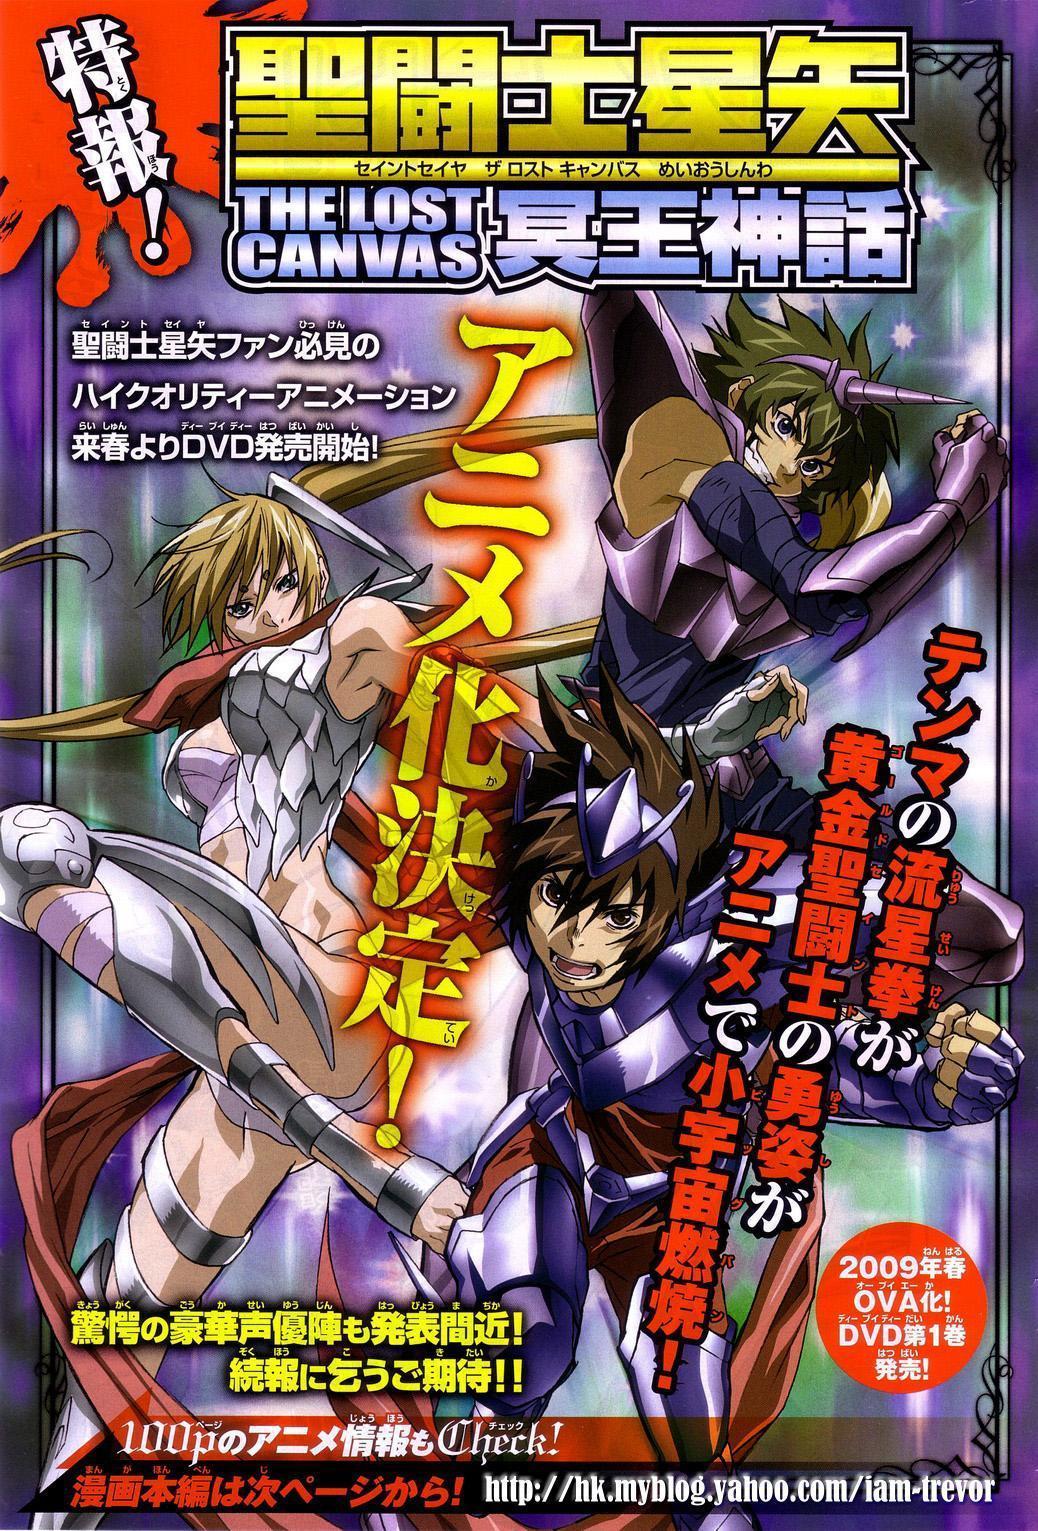 LC112_anime_01.jpg